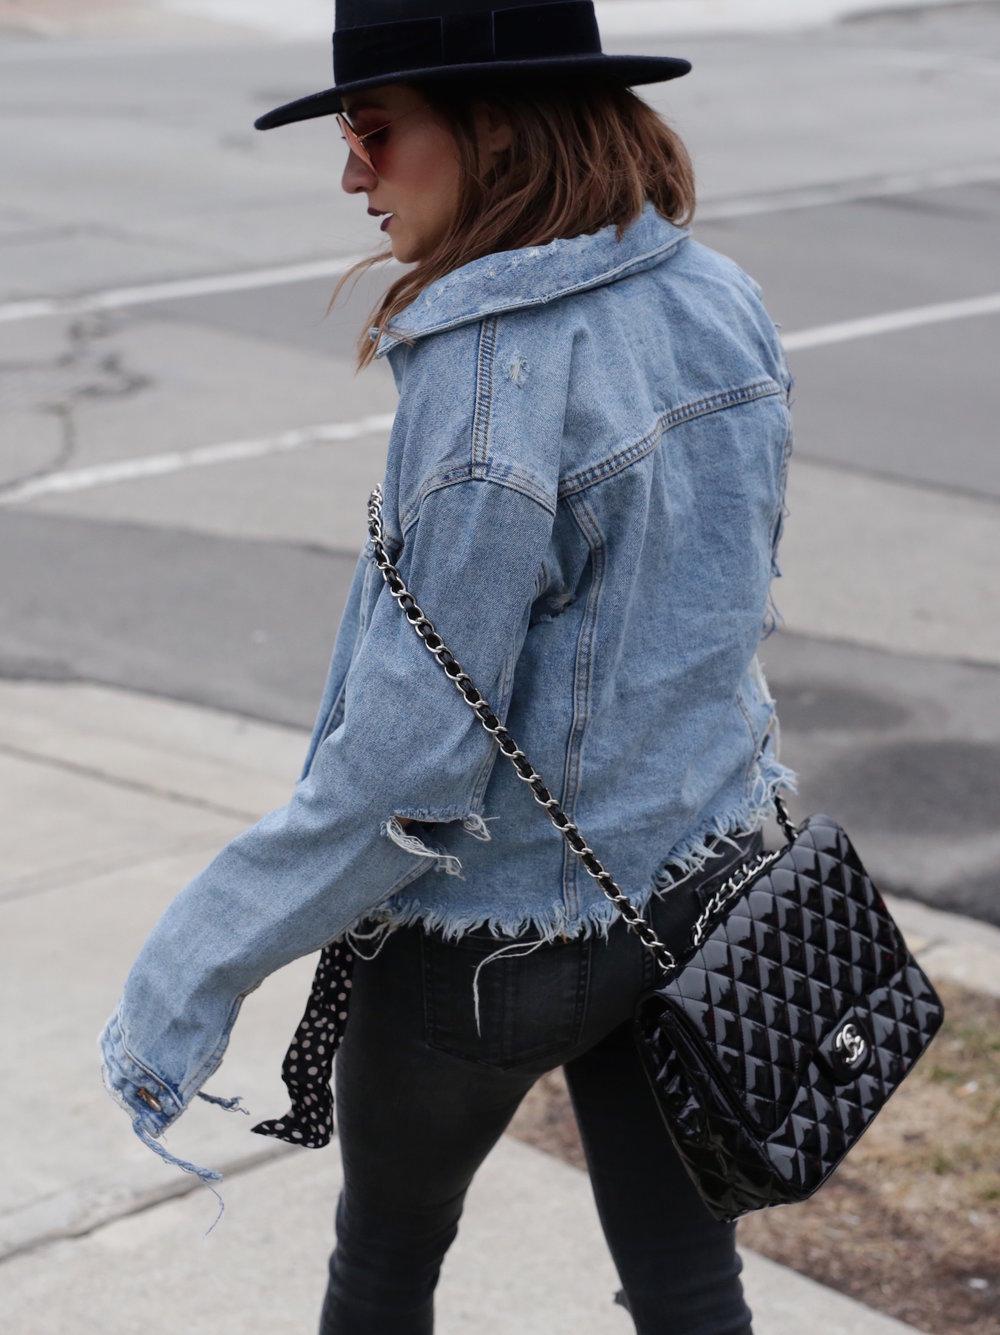 Patent leather Chanel jumbo bag, Saint Laurent platform boots, shredded denim jacket street style - woahstyle.com_7475.JPG